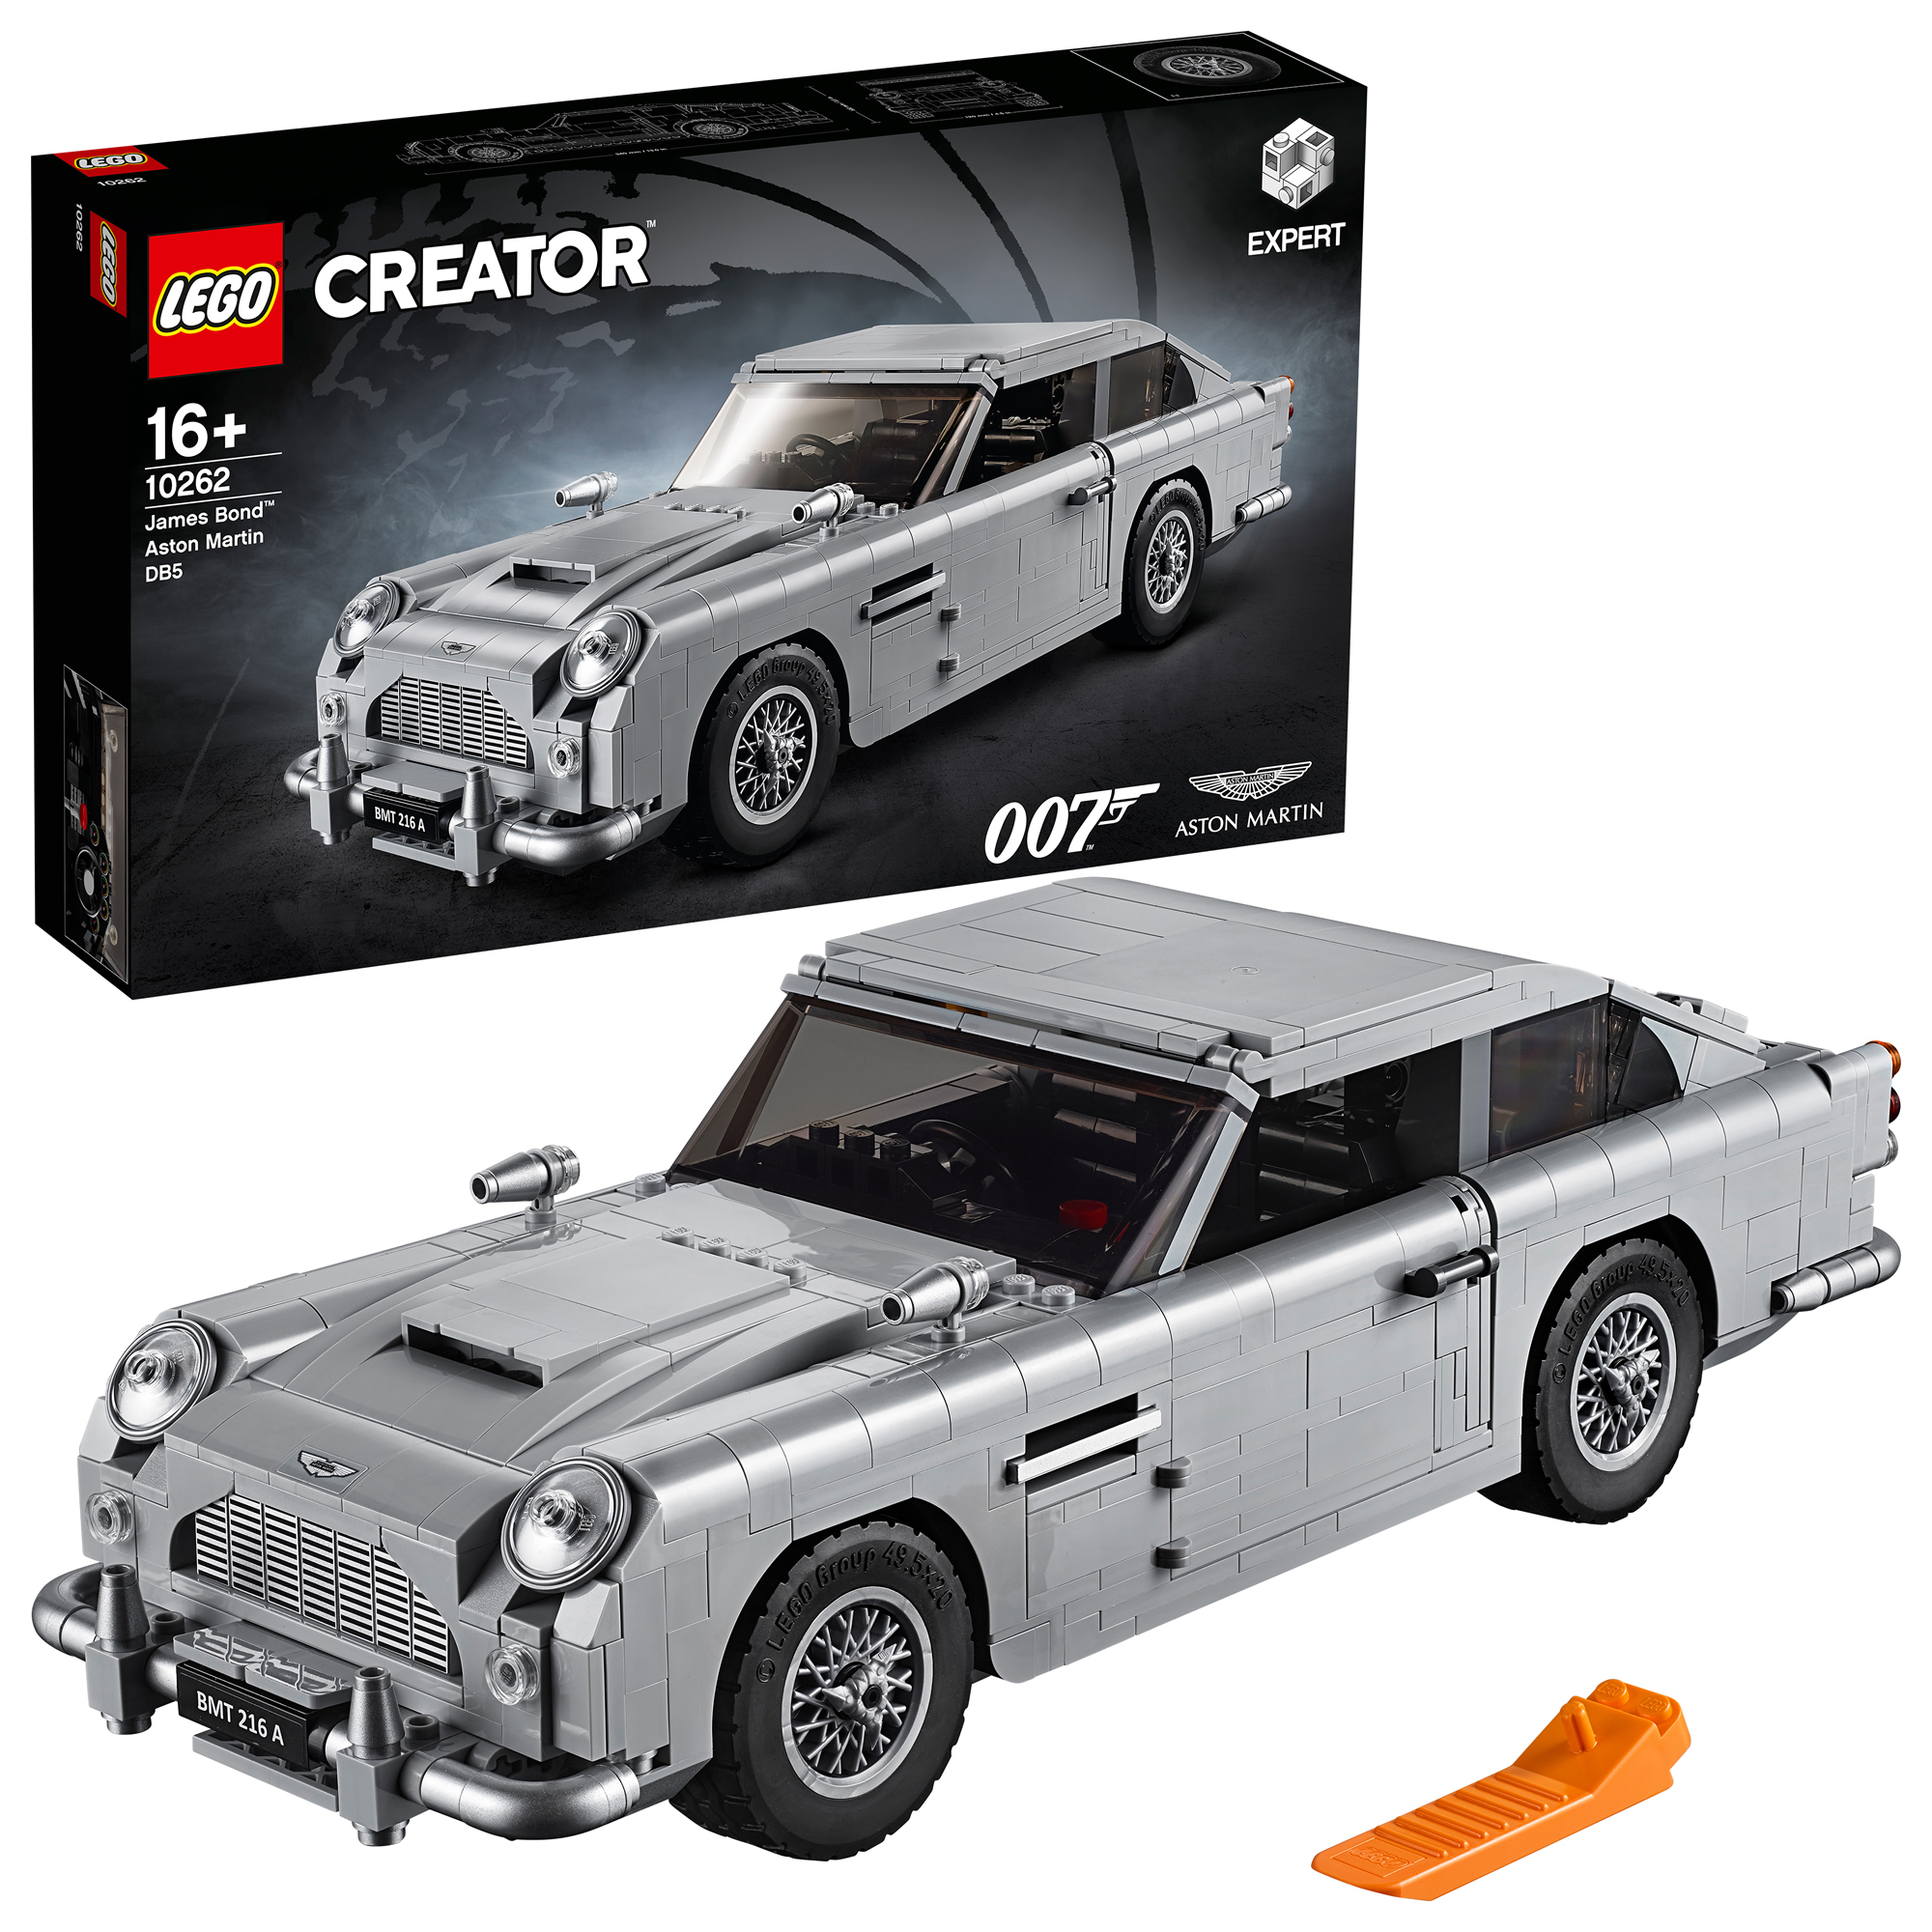 10262 James Bond™ Aston Martin DB5 Lego Creator Expert Toys Center